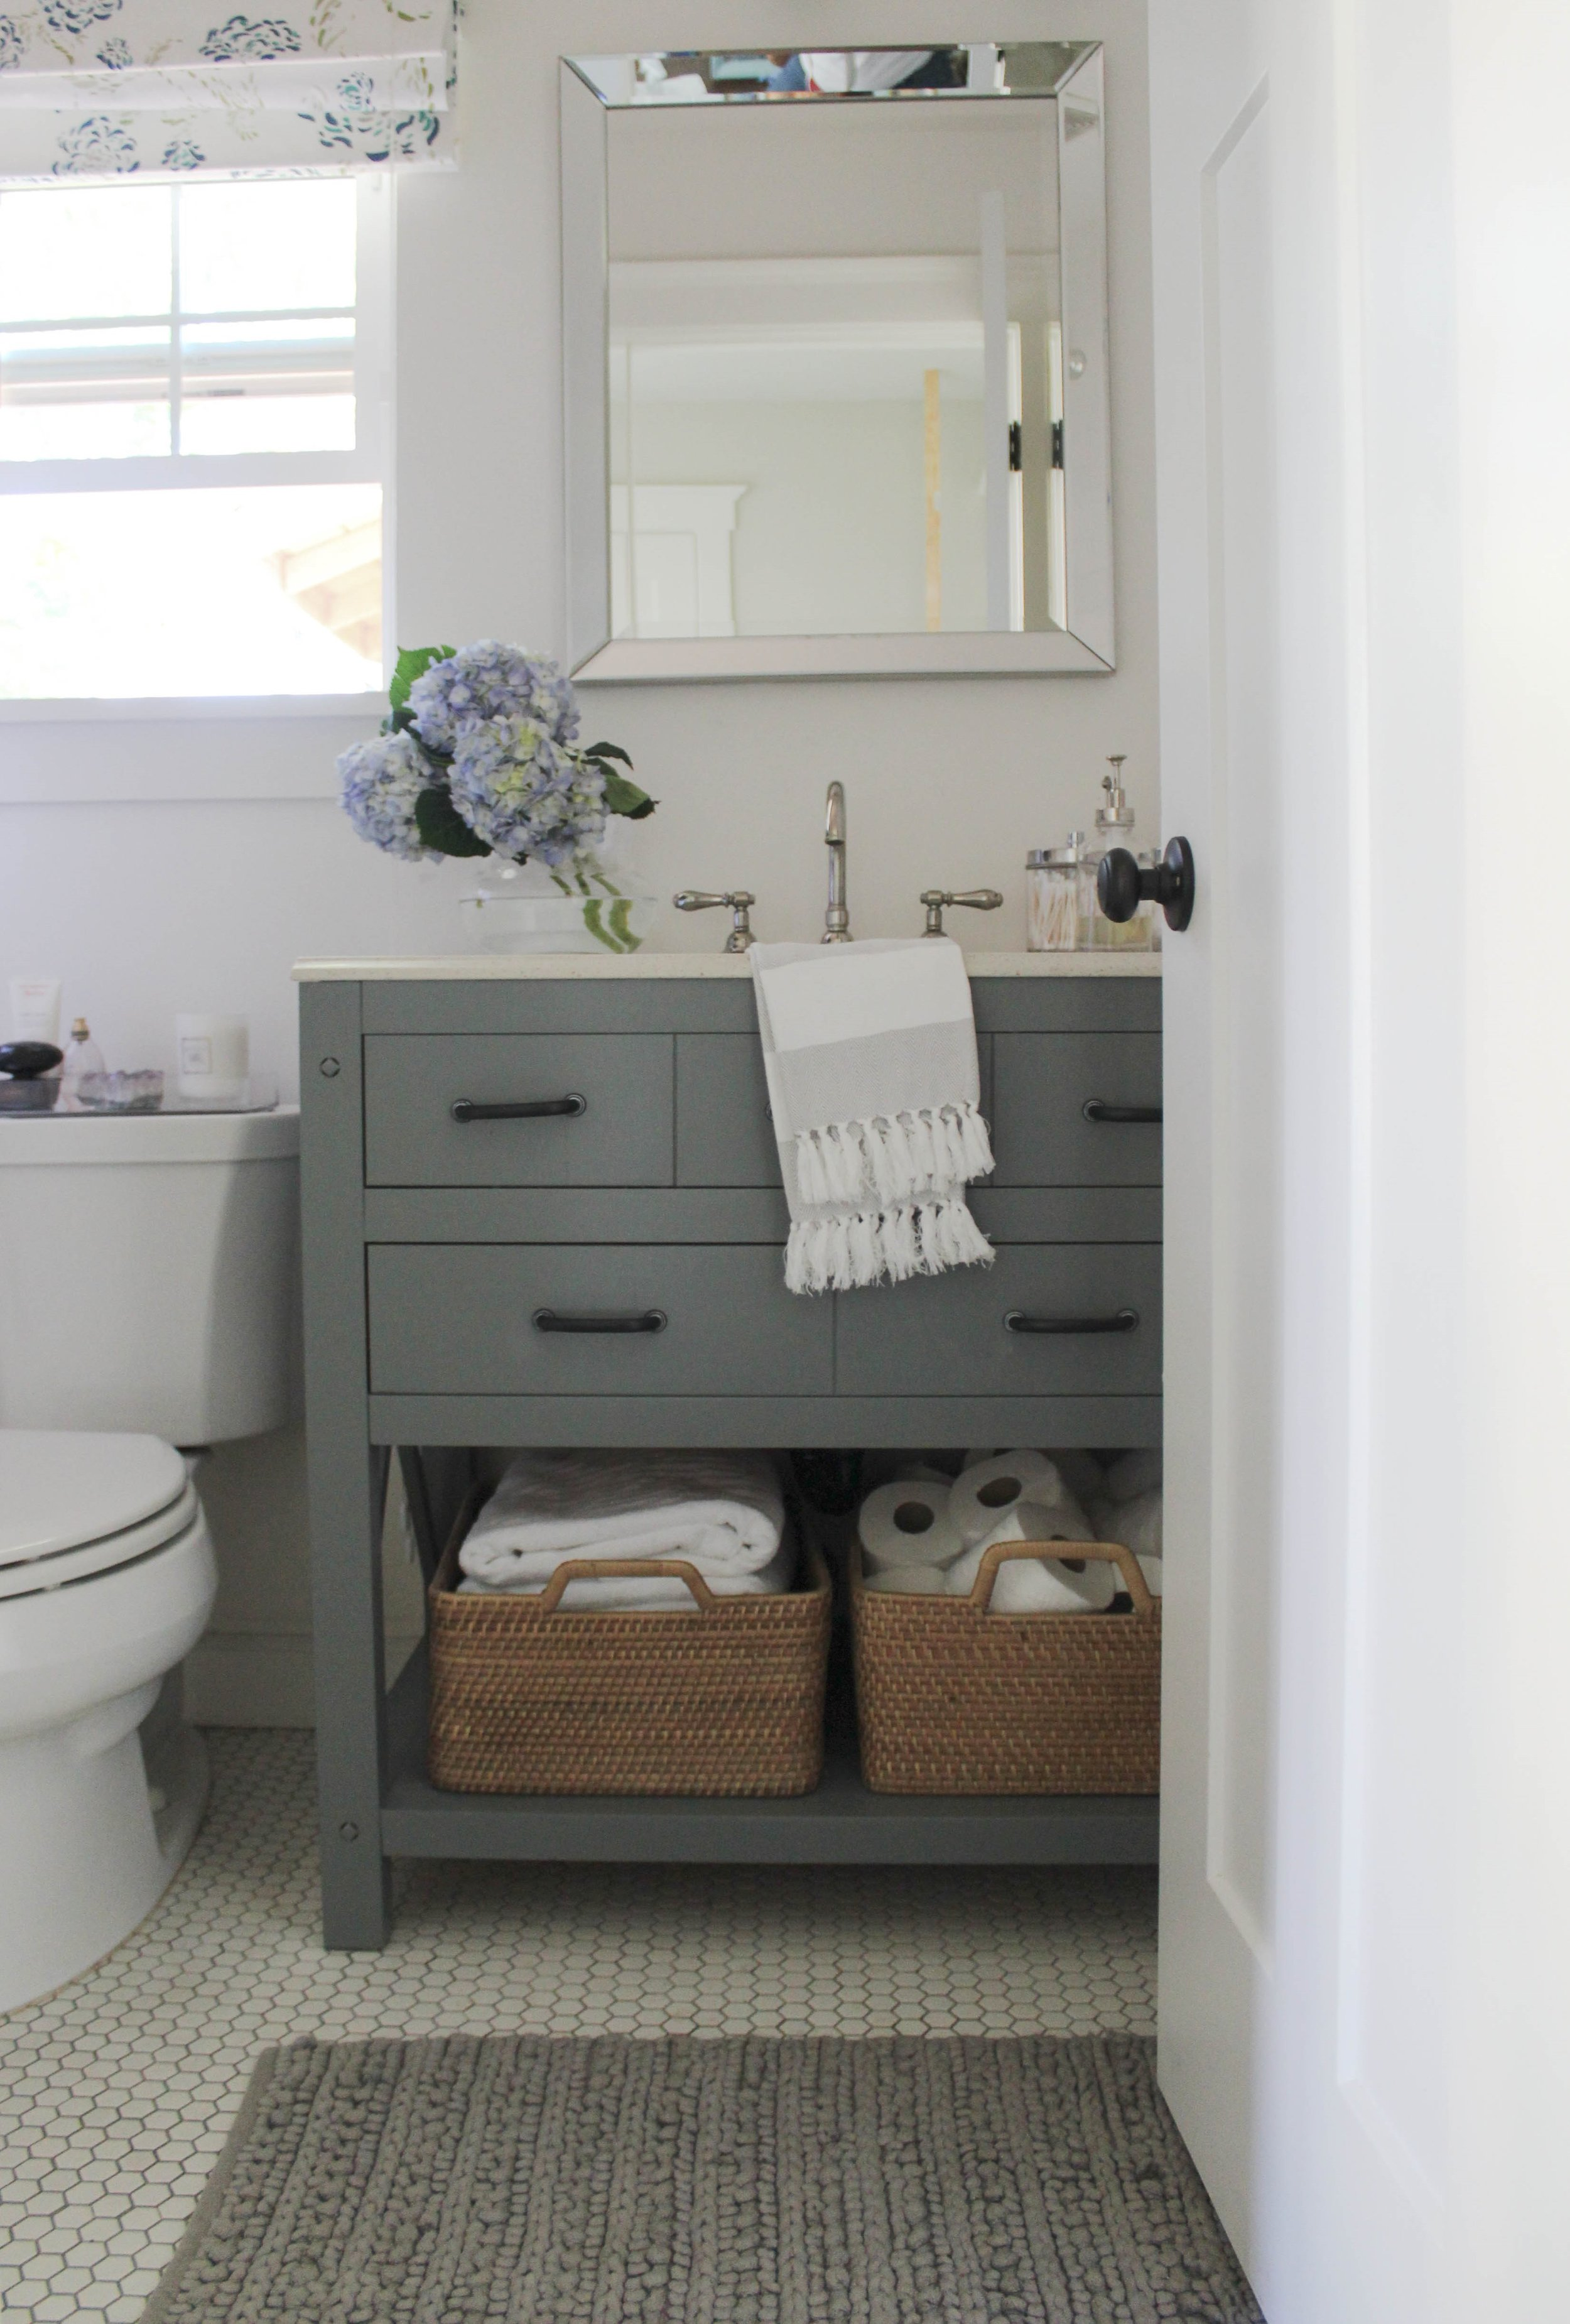 Rethinking My Bathroom Vanity Katrina Blair Interior Design Small Home Style Modern Livingkatrina Blair